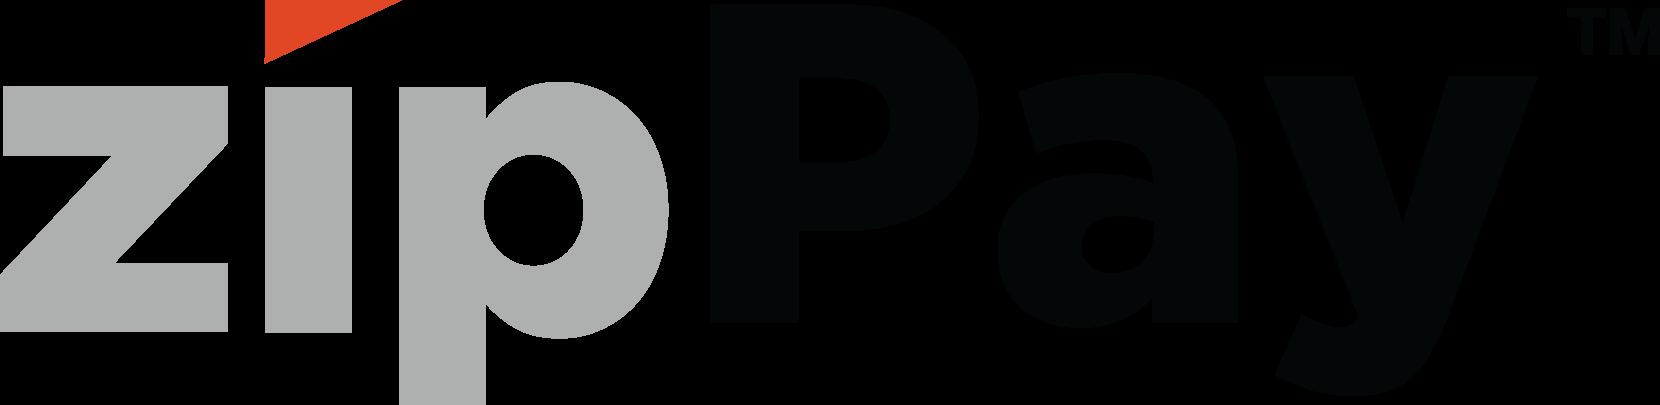 zipPay-logo